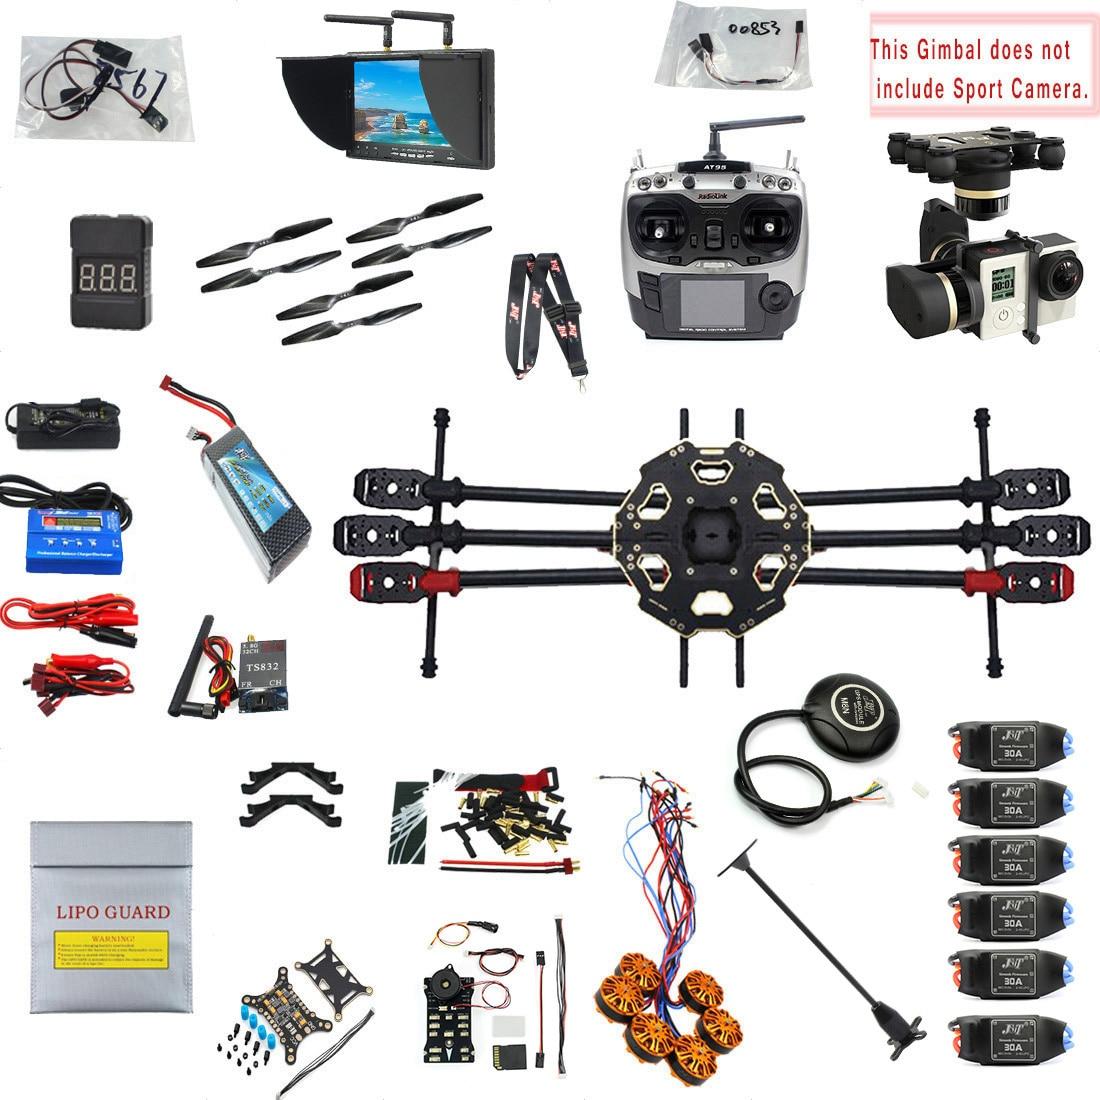 JMT 2.4G 9CH F07807-G 680PRO PX4 GPS de Vídeo 5.8G FPV RC Helicóptero RTF Kit Completo DIY RC Zangão combo MINI3D Pro Gimbal